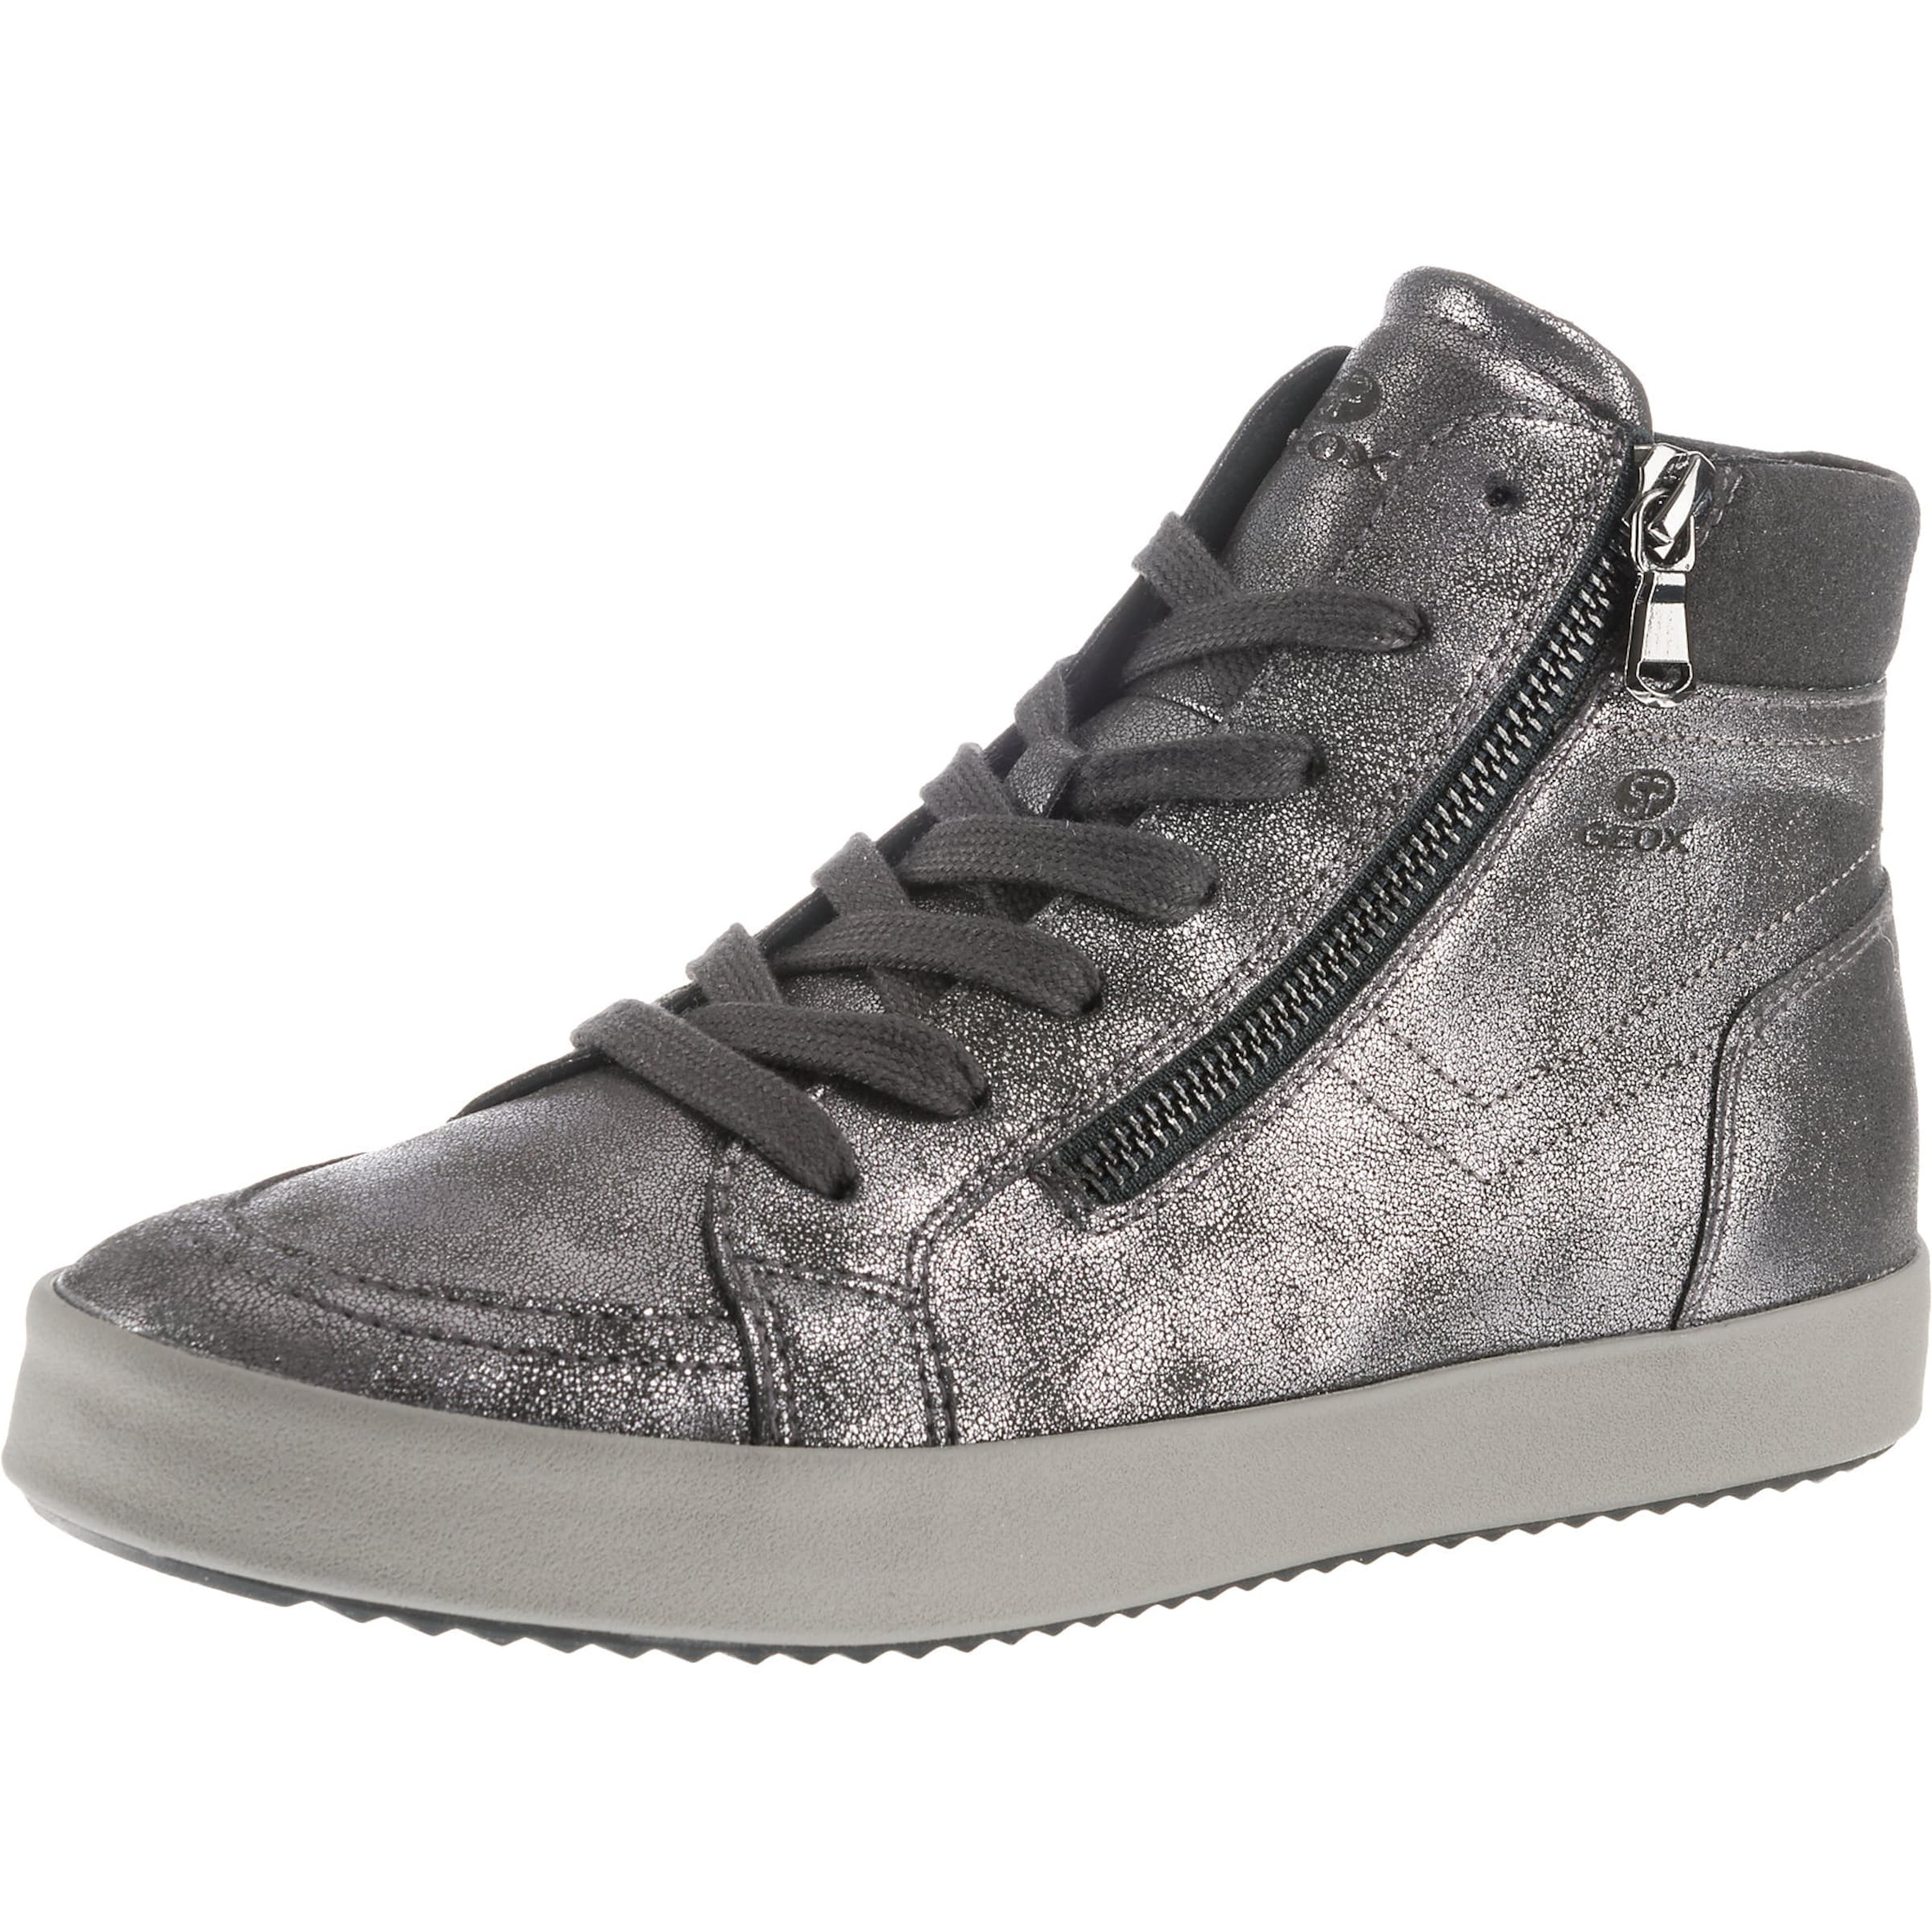 Donkergrijs In Hoog Geox 'blomiee' Sneakers CBQdtxrsh